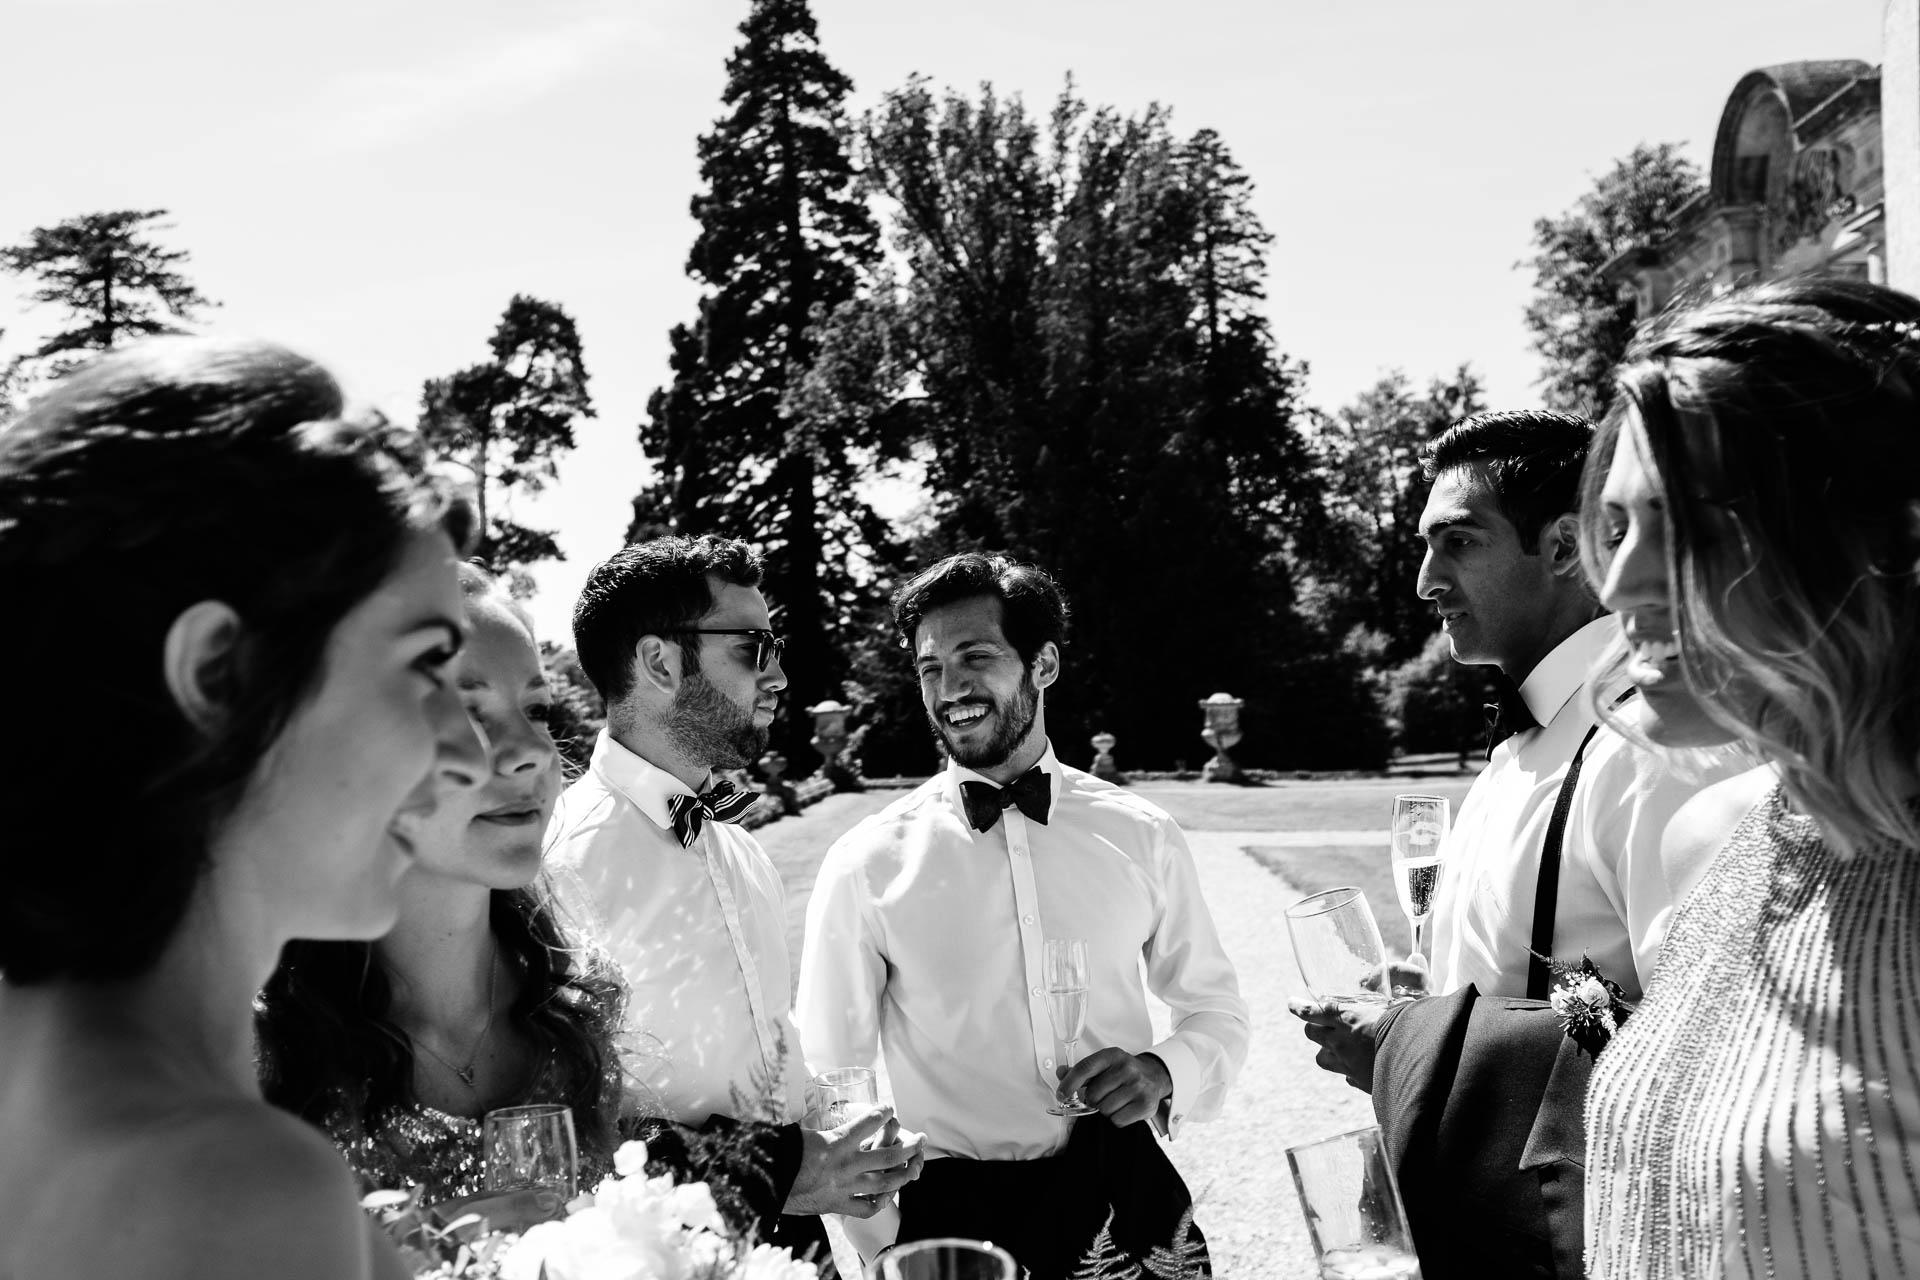 orchardleigh house wedding - Danni & Barney (233).jpg